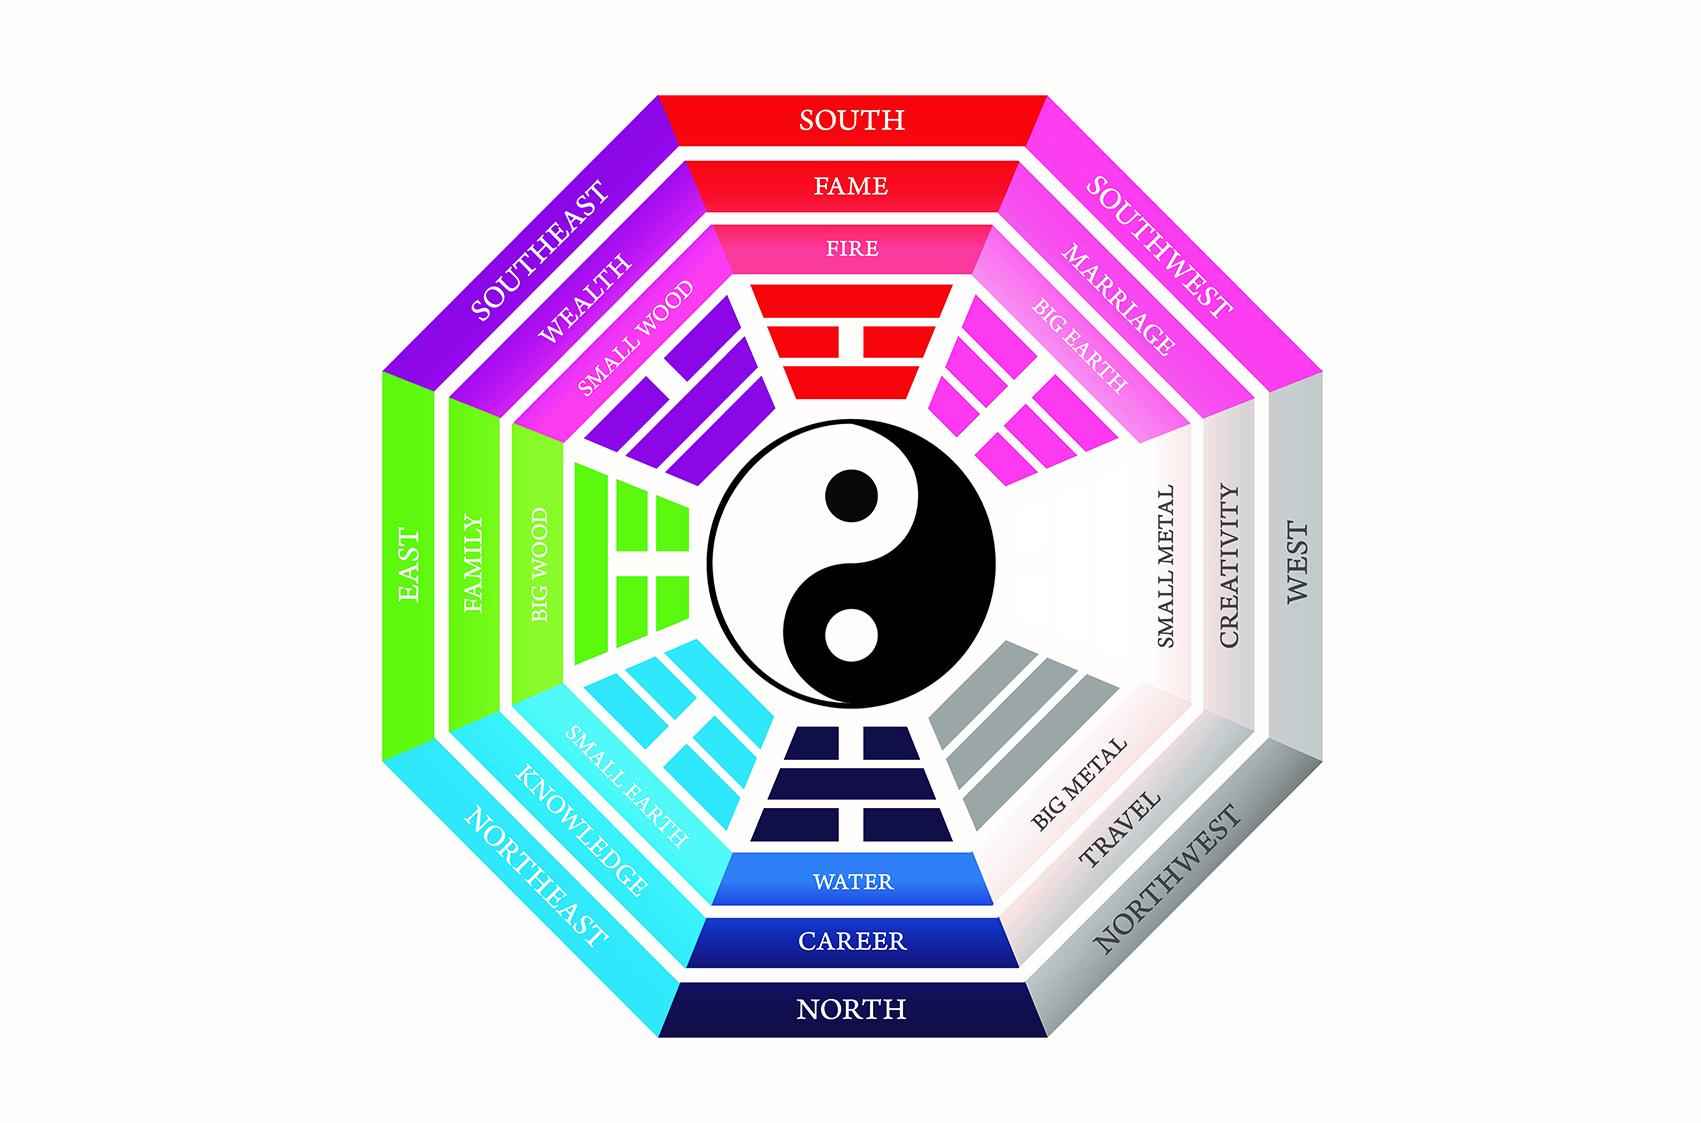 Feng+shui+bagua+map+classical+2.jpg